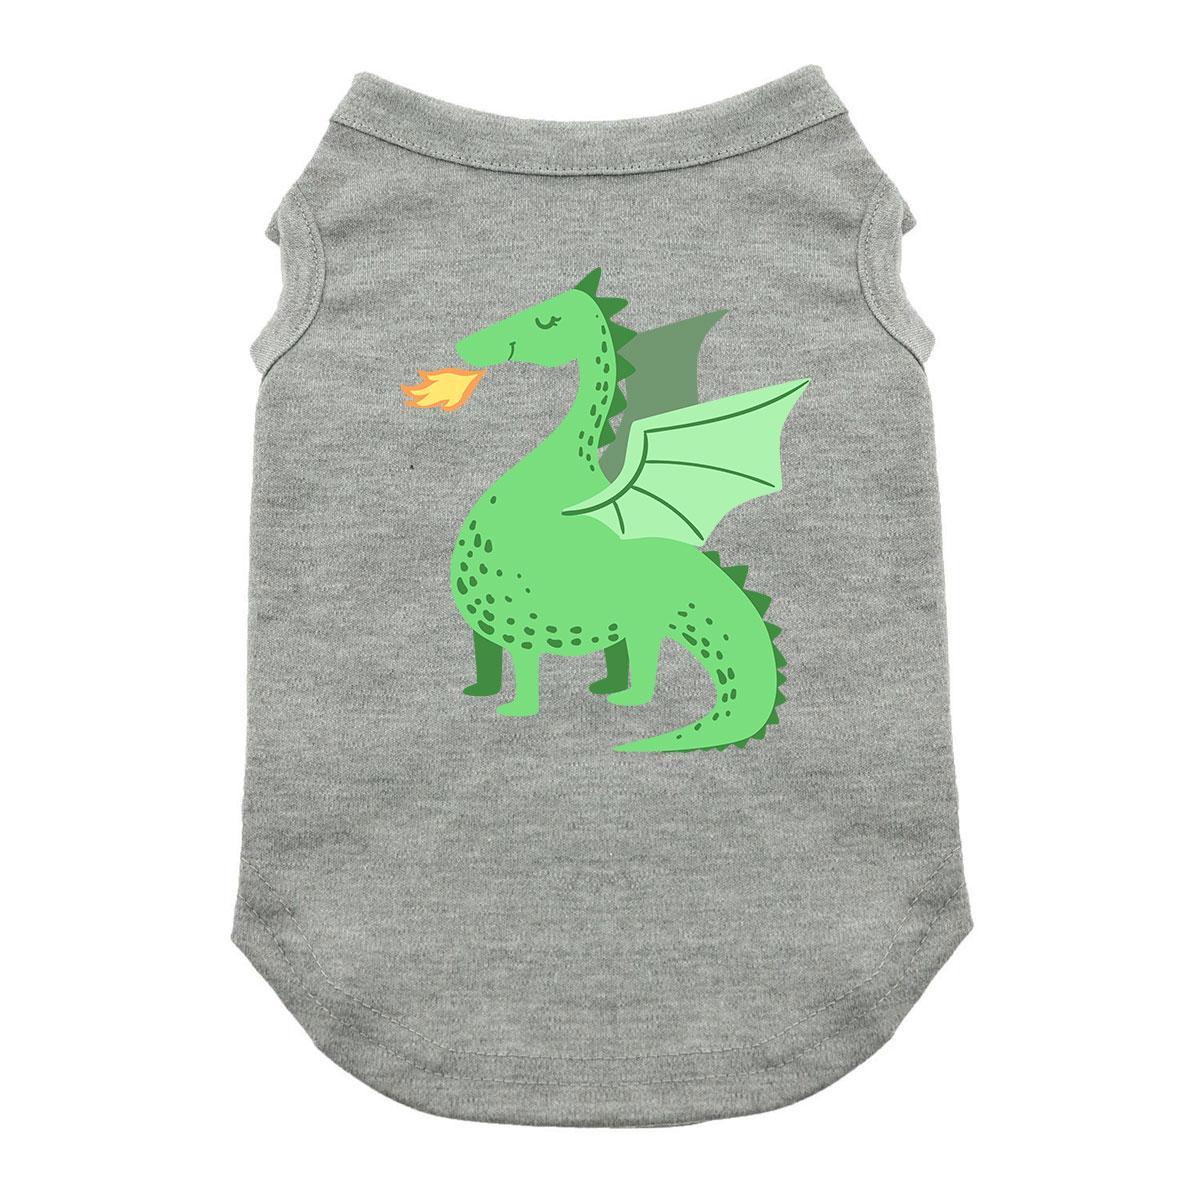 Cute Dragon Dog Shirt - Gray